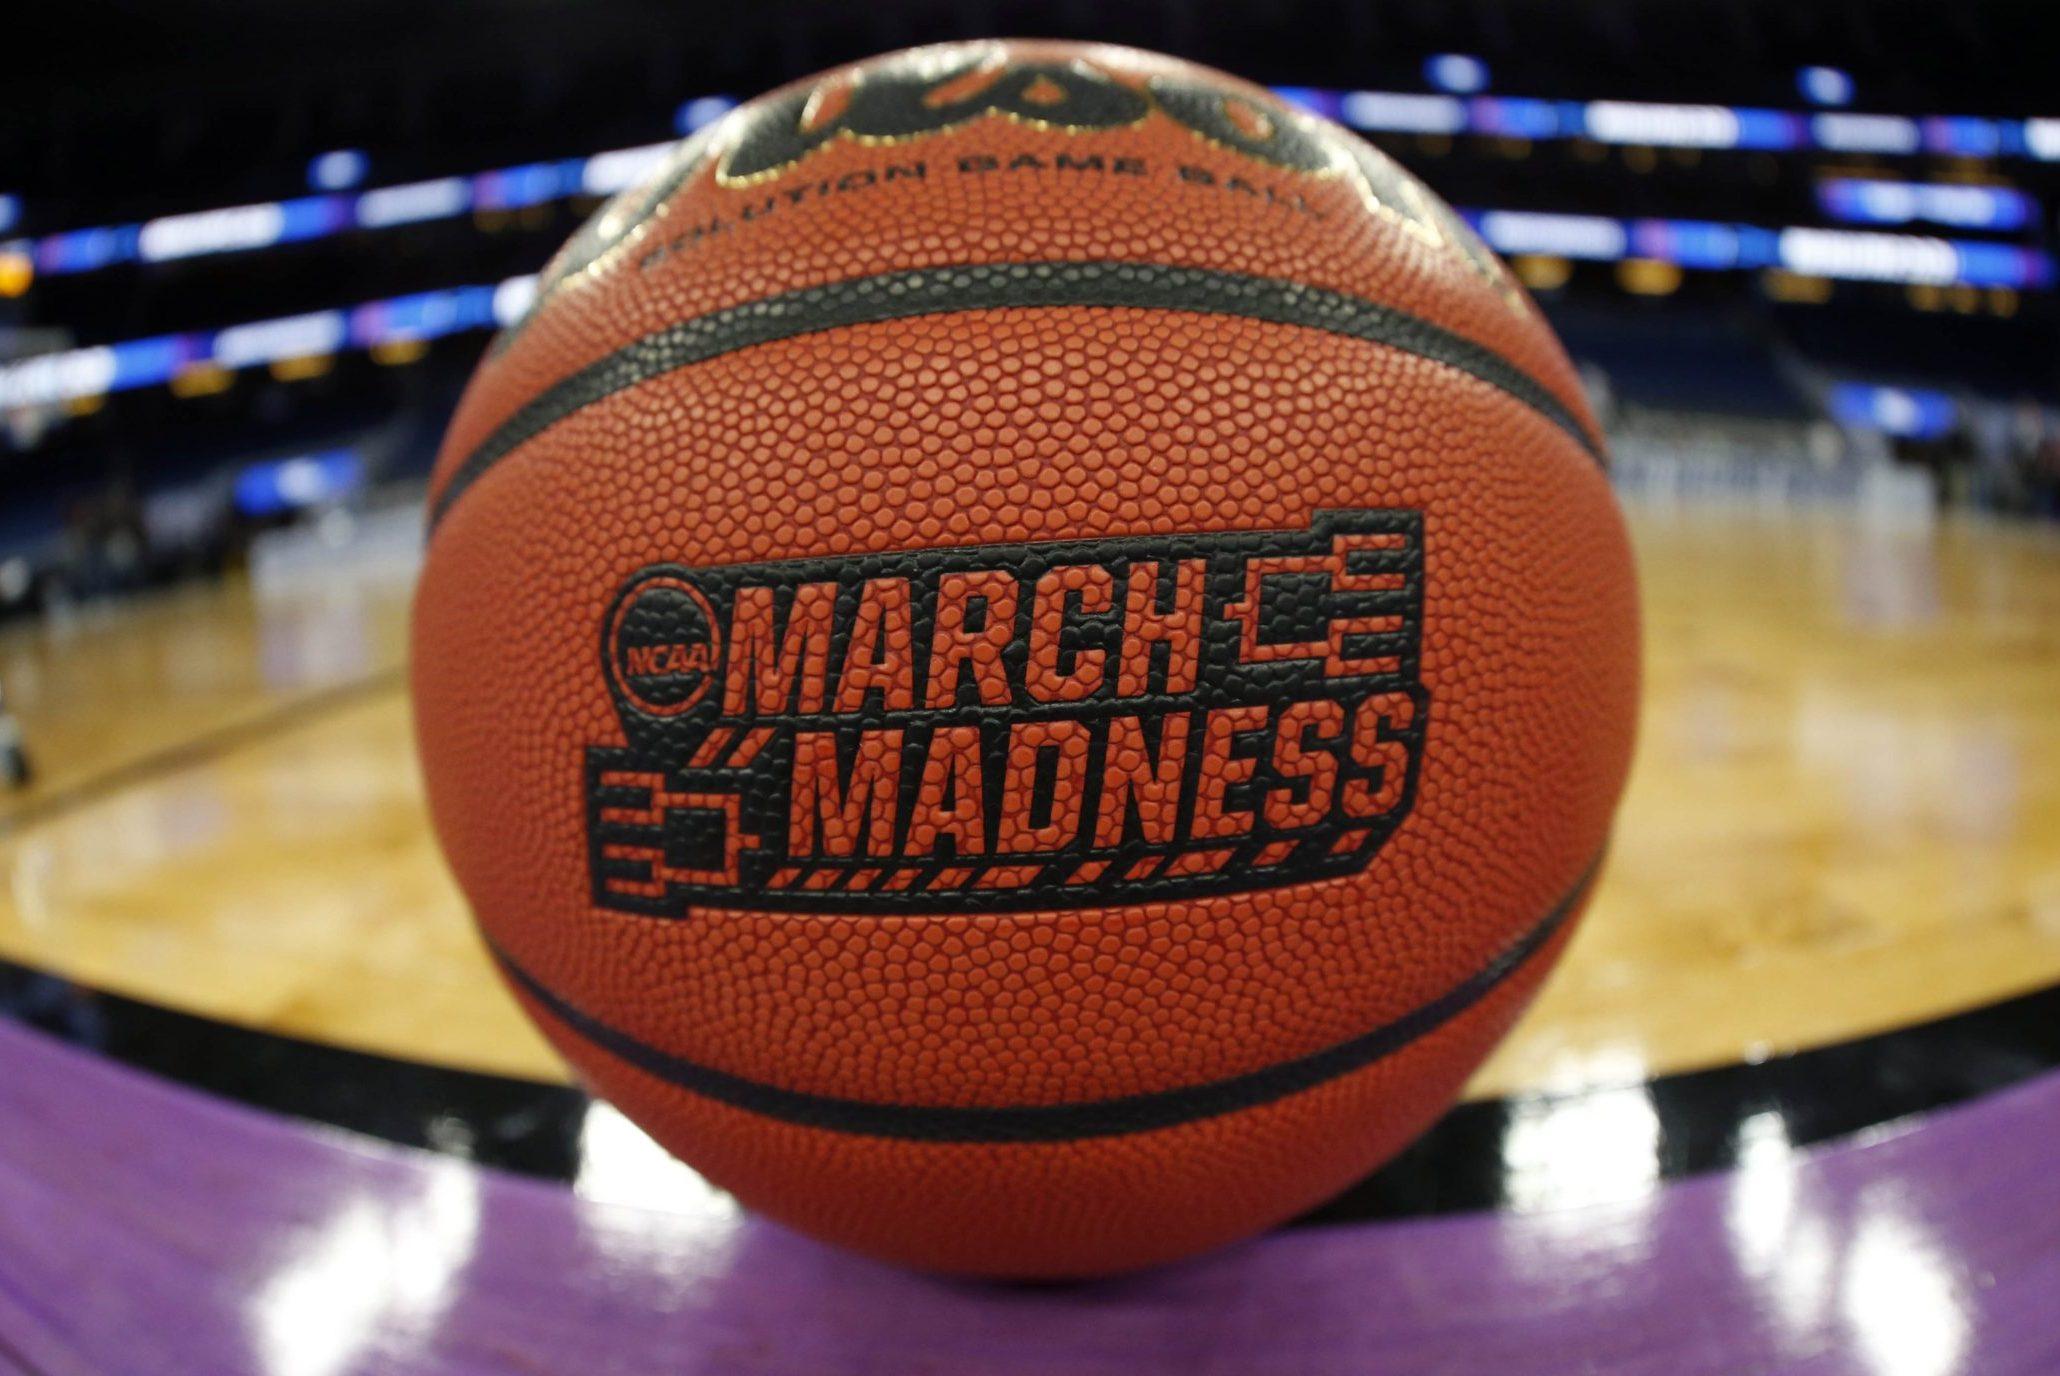 NCAA basketball tournament in a bubble?